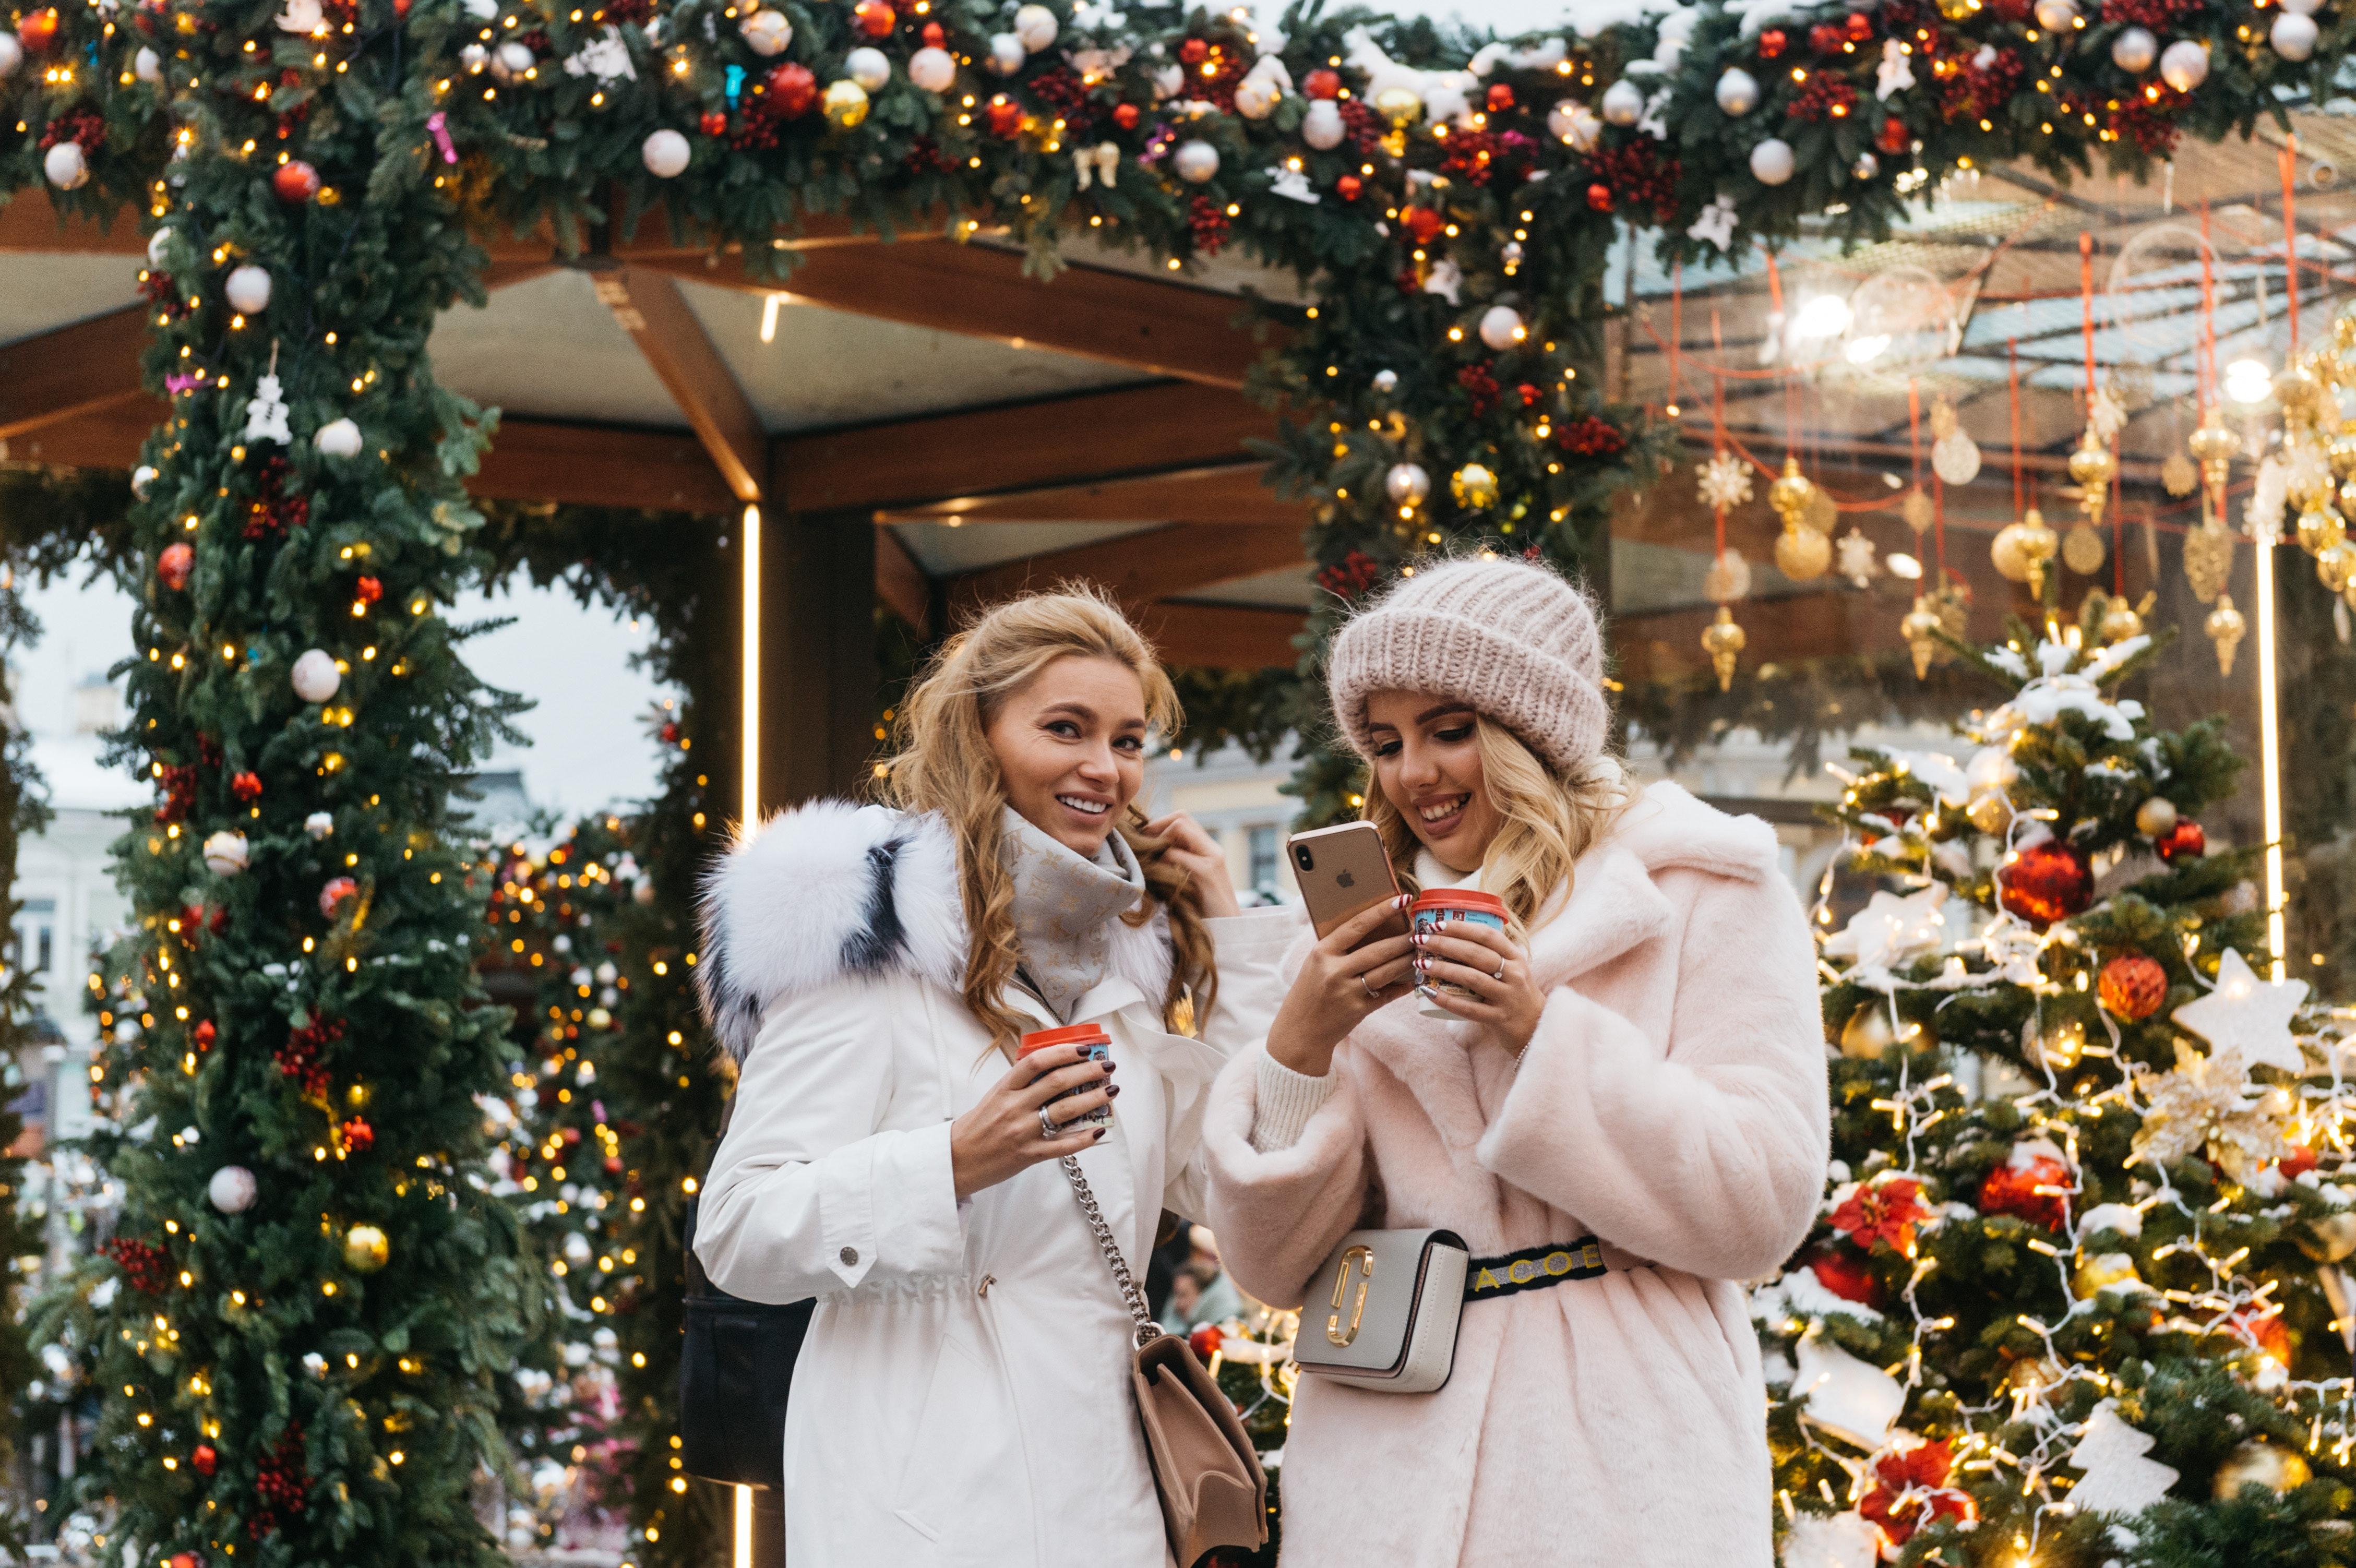 Blog Hivency_Christmas time_Photo de Anton Belitskiy provenant de Pexels